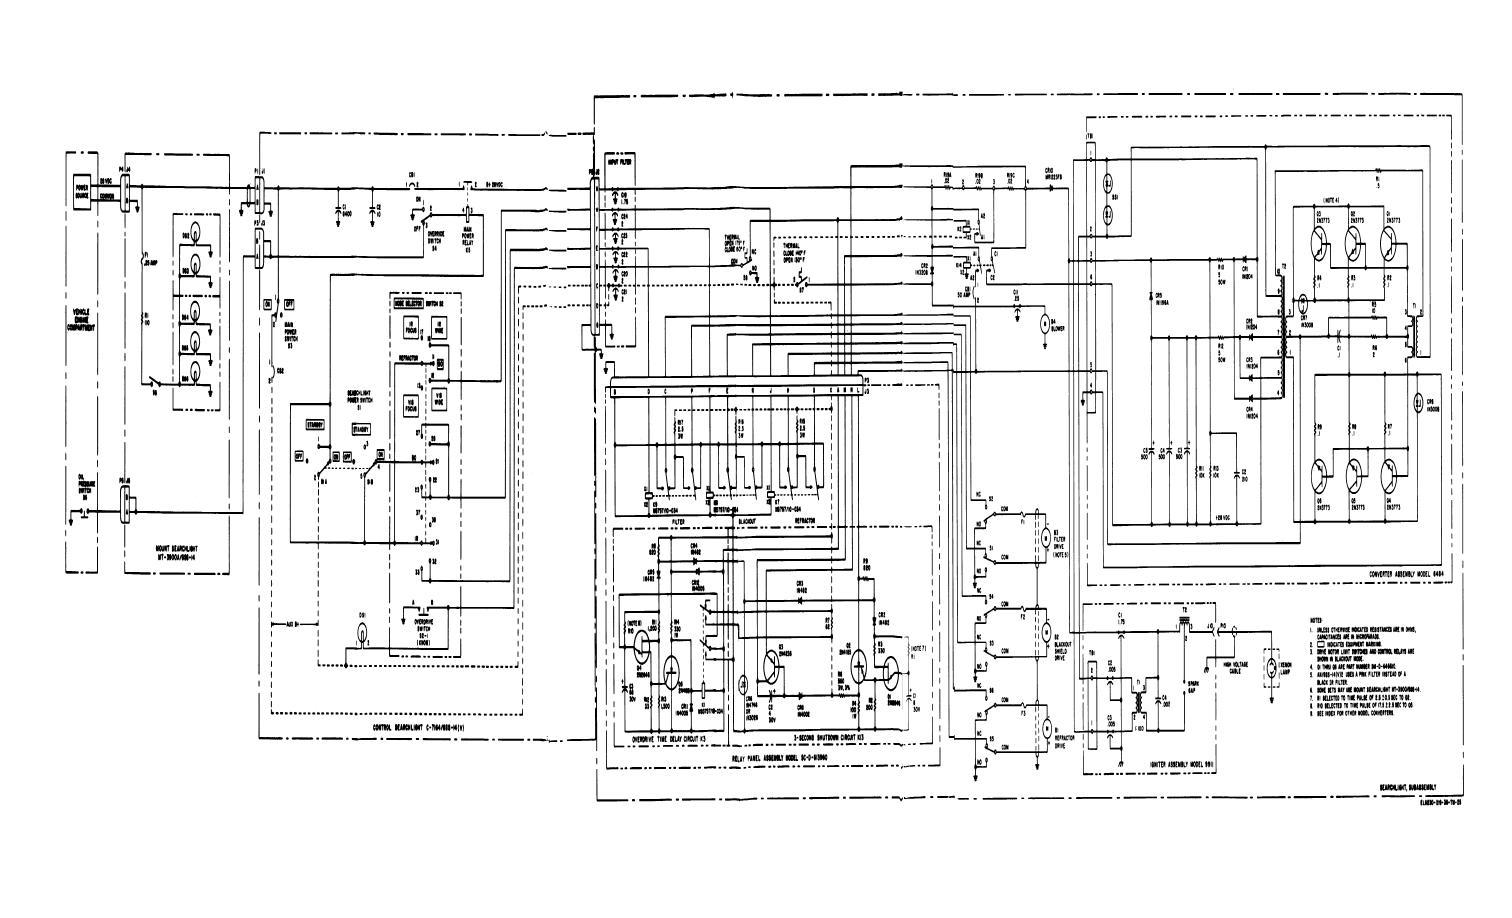 fo 9 an gss 14 v schematic diagram. Black Bedroom Furniture Sets. Home Design Ideas